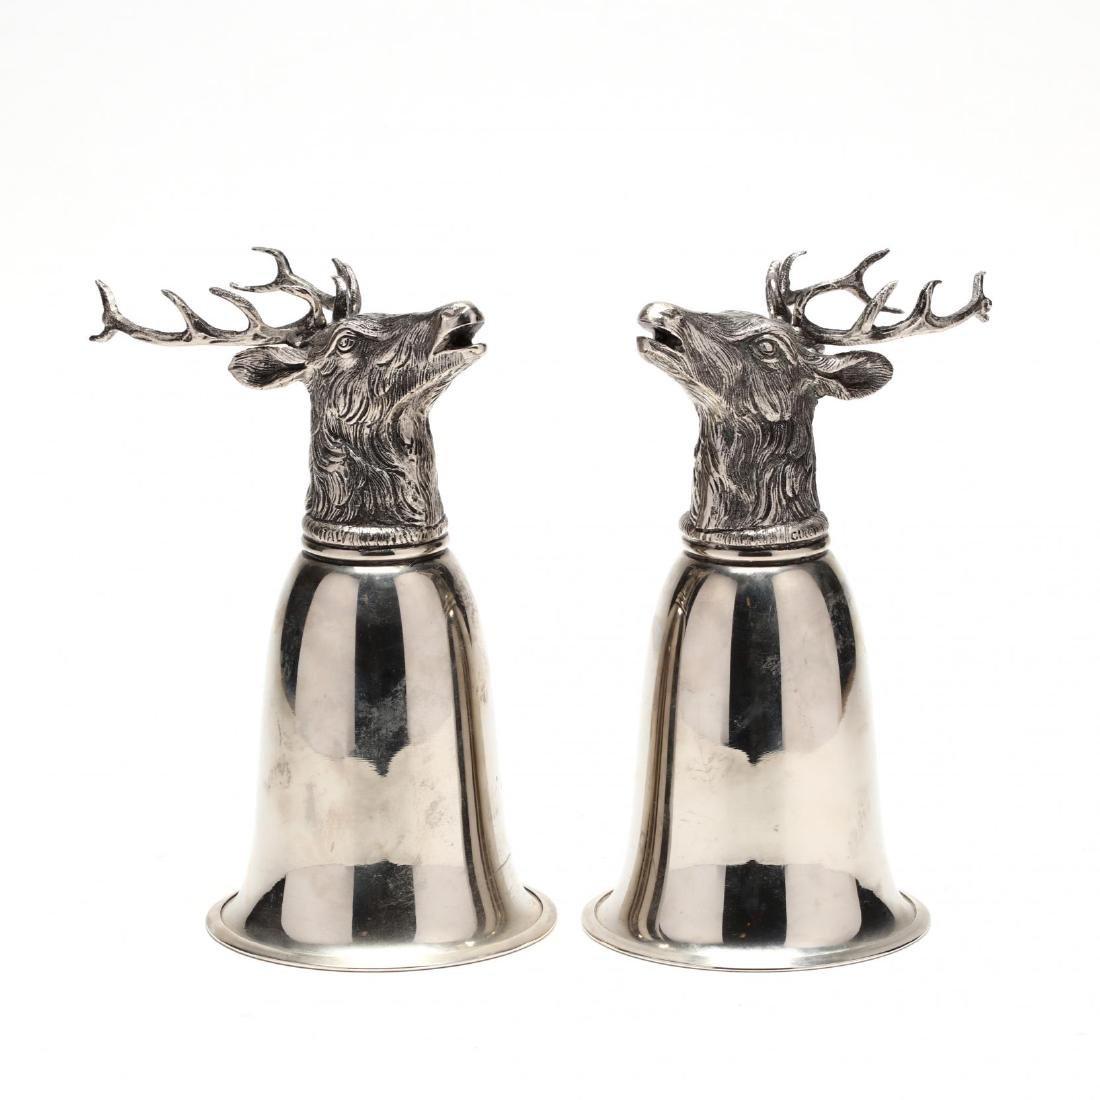 A Pair of Gucci Silverplate Stirrup Cups